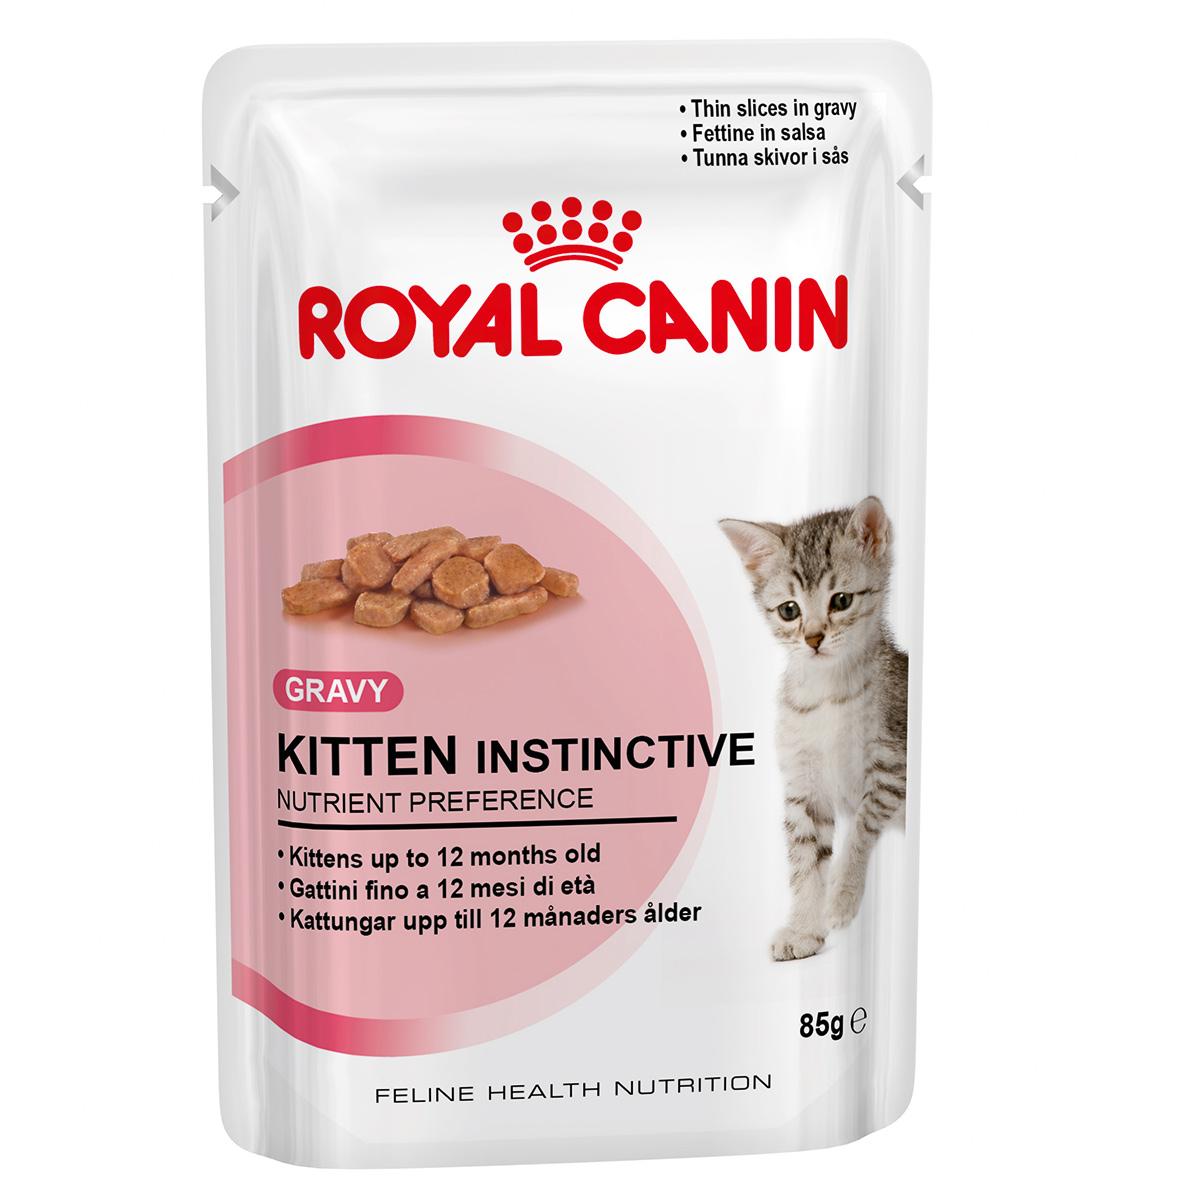 Royal Canin Kitten Instinctive, 1 plic x 85 g imagine